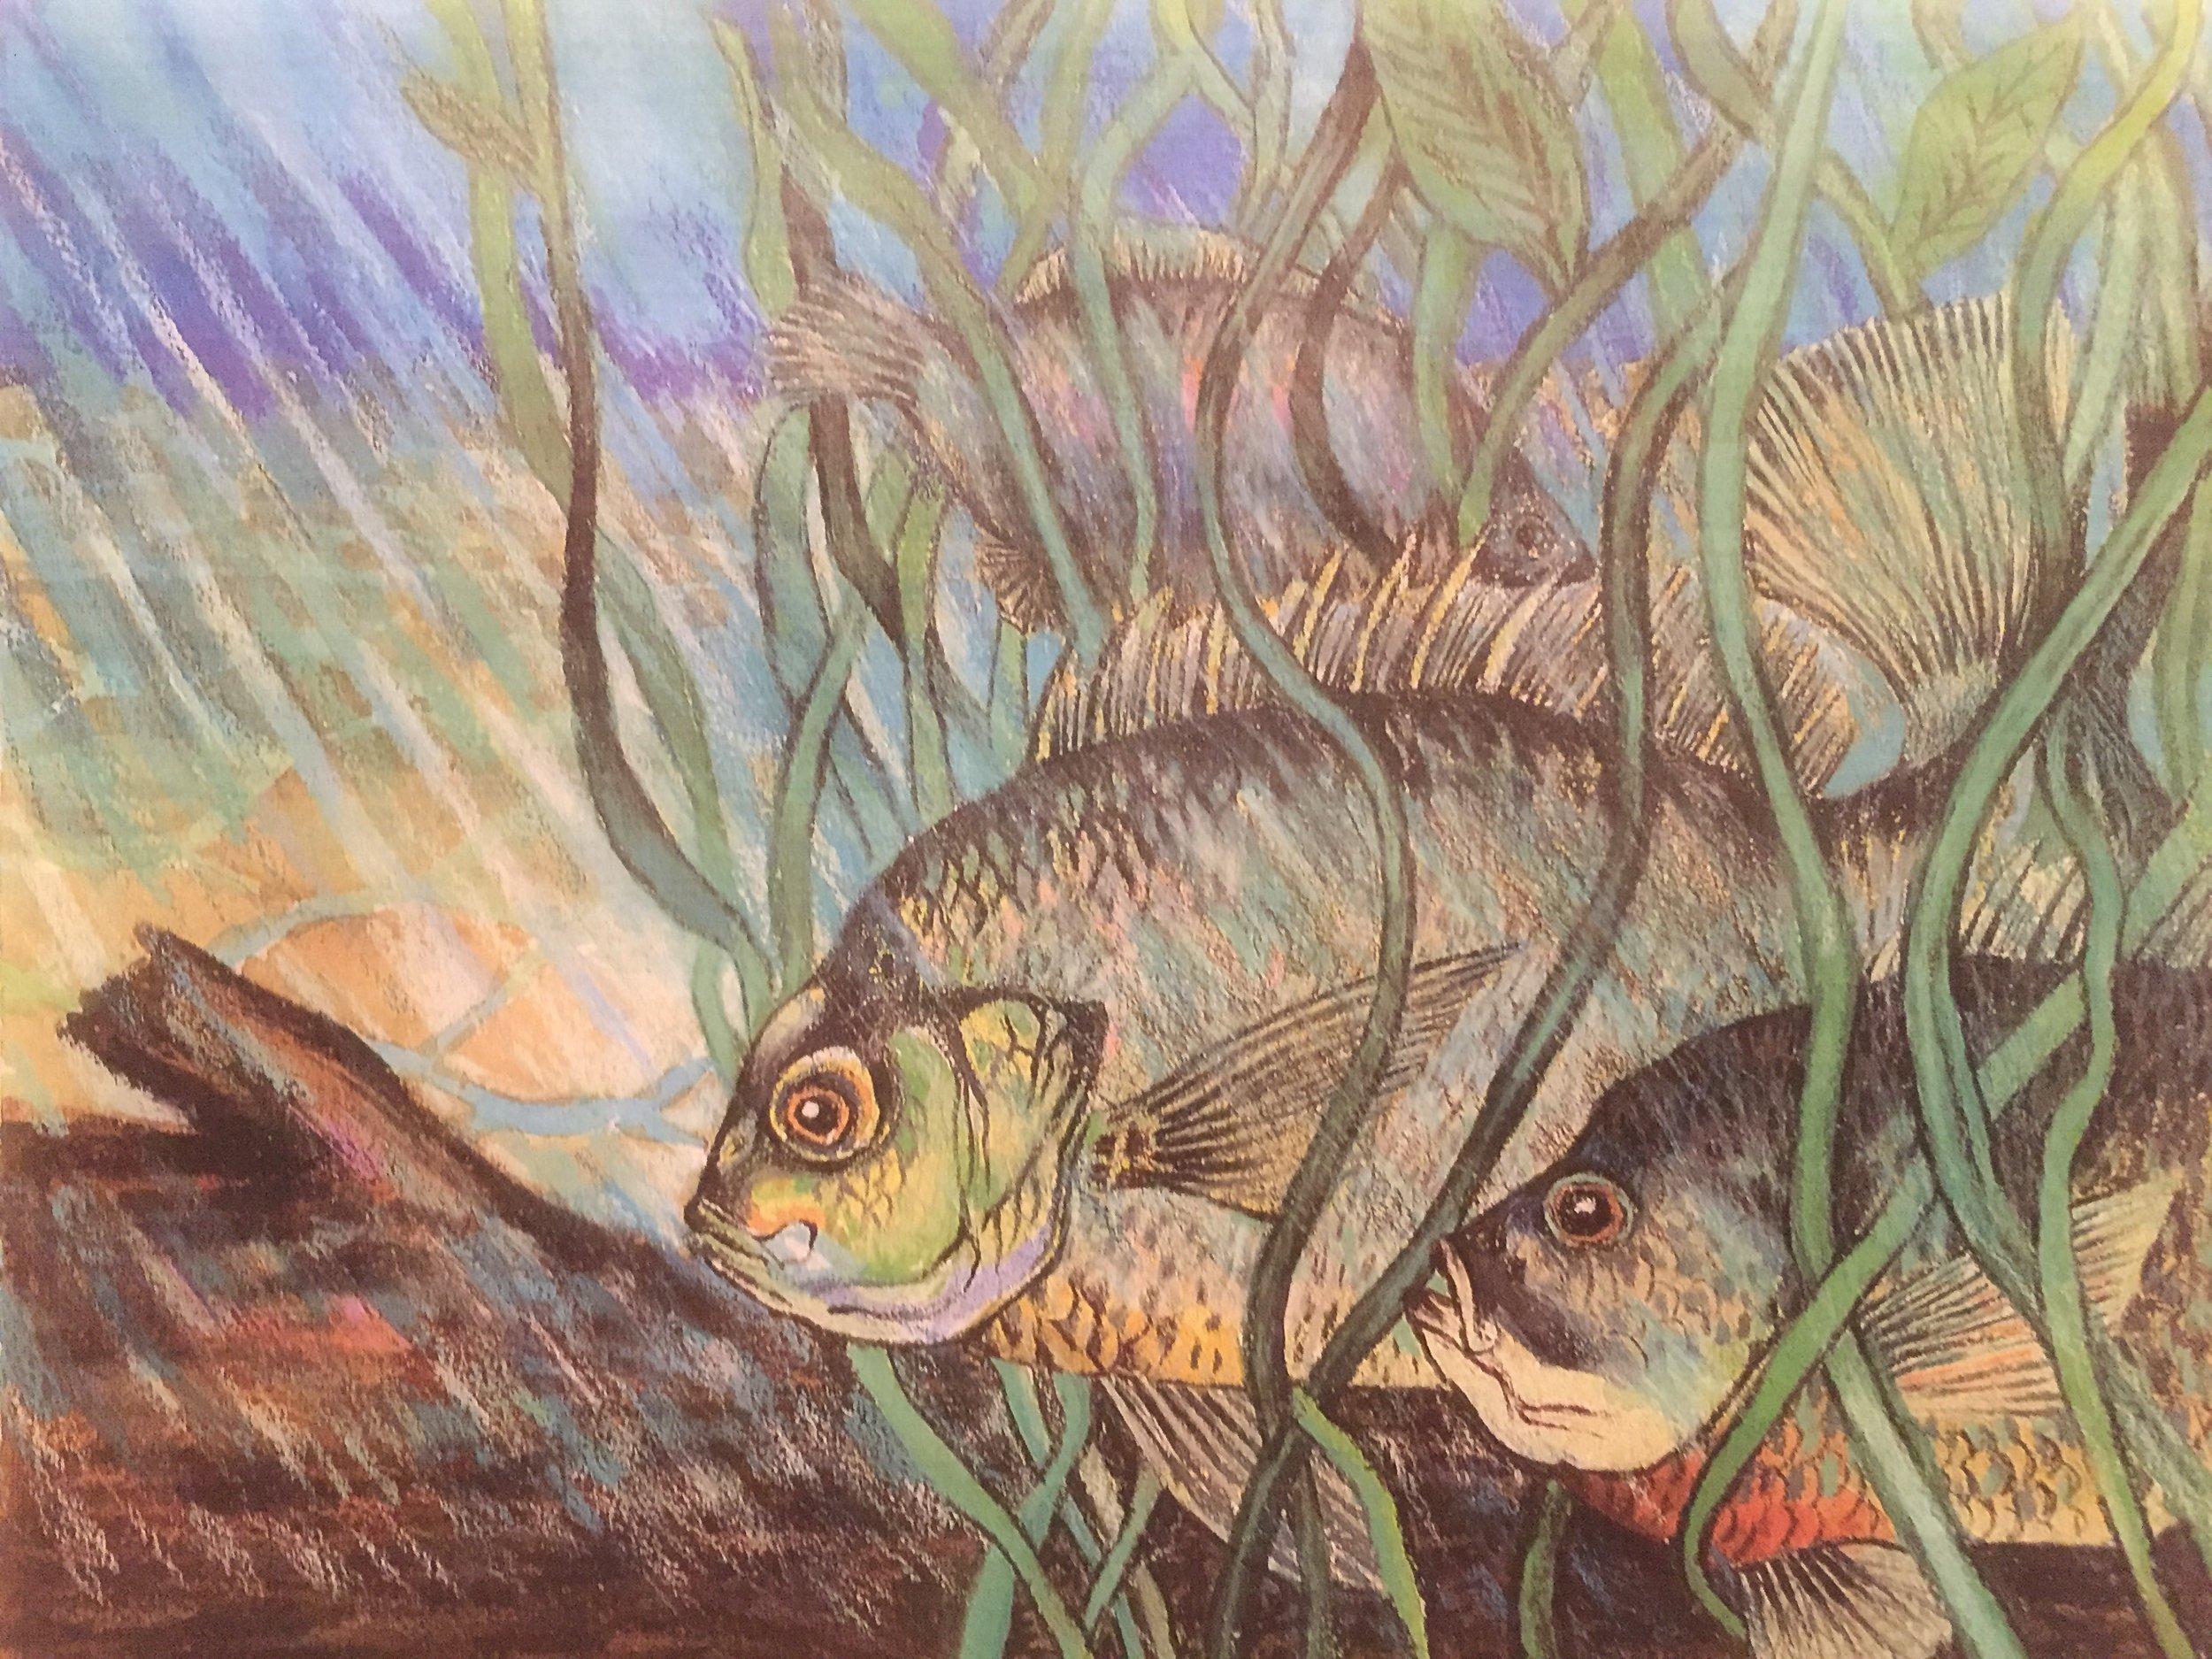 Bluegill, Colored Pencils on Watercolor